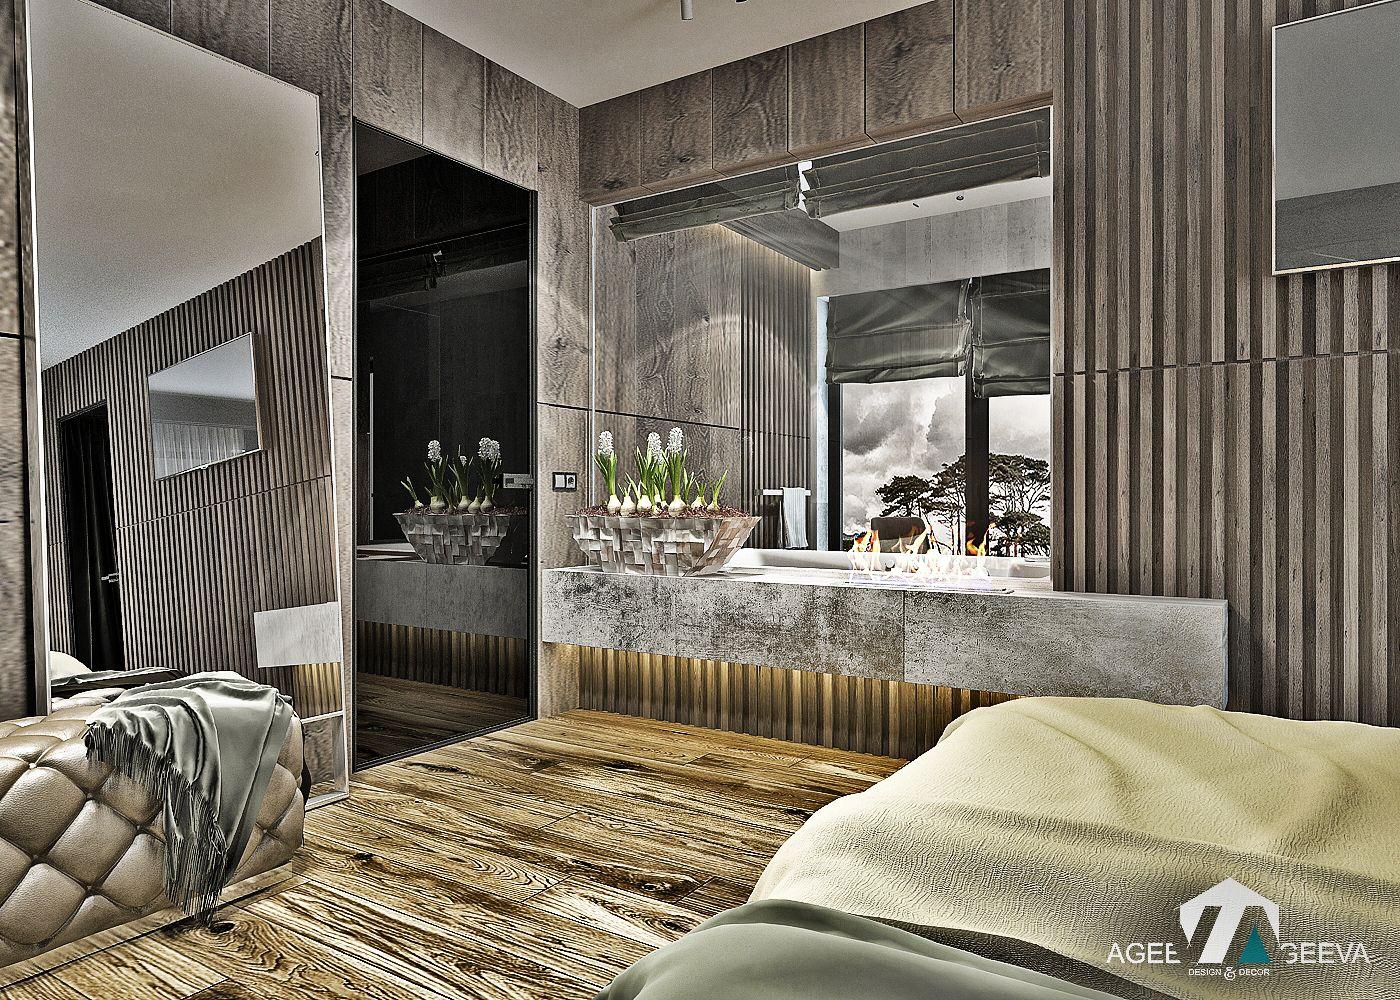 Perfect дизайн санузла в загородном доме,тропический душ, бетон, дерево, камин  Www.ageev Ageeva.com | Interior Design U0026 Contemporary Architecture |  Pinterest ...